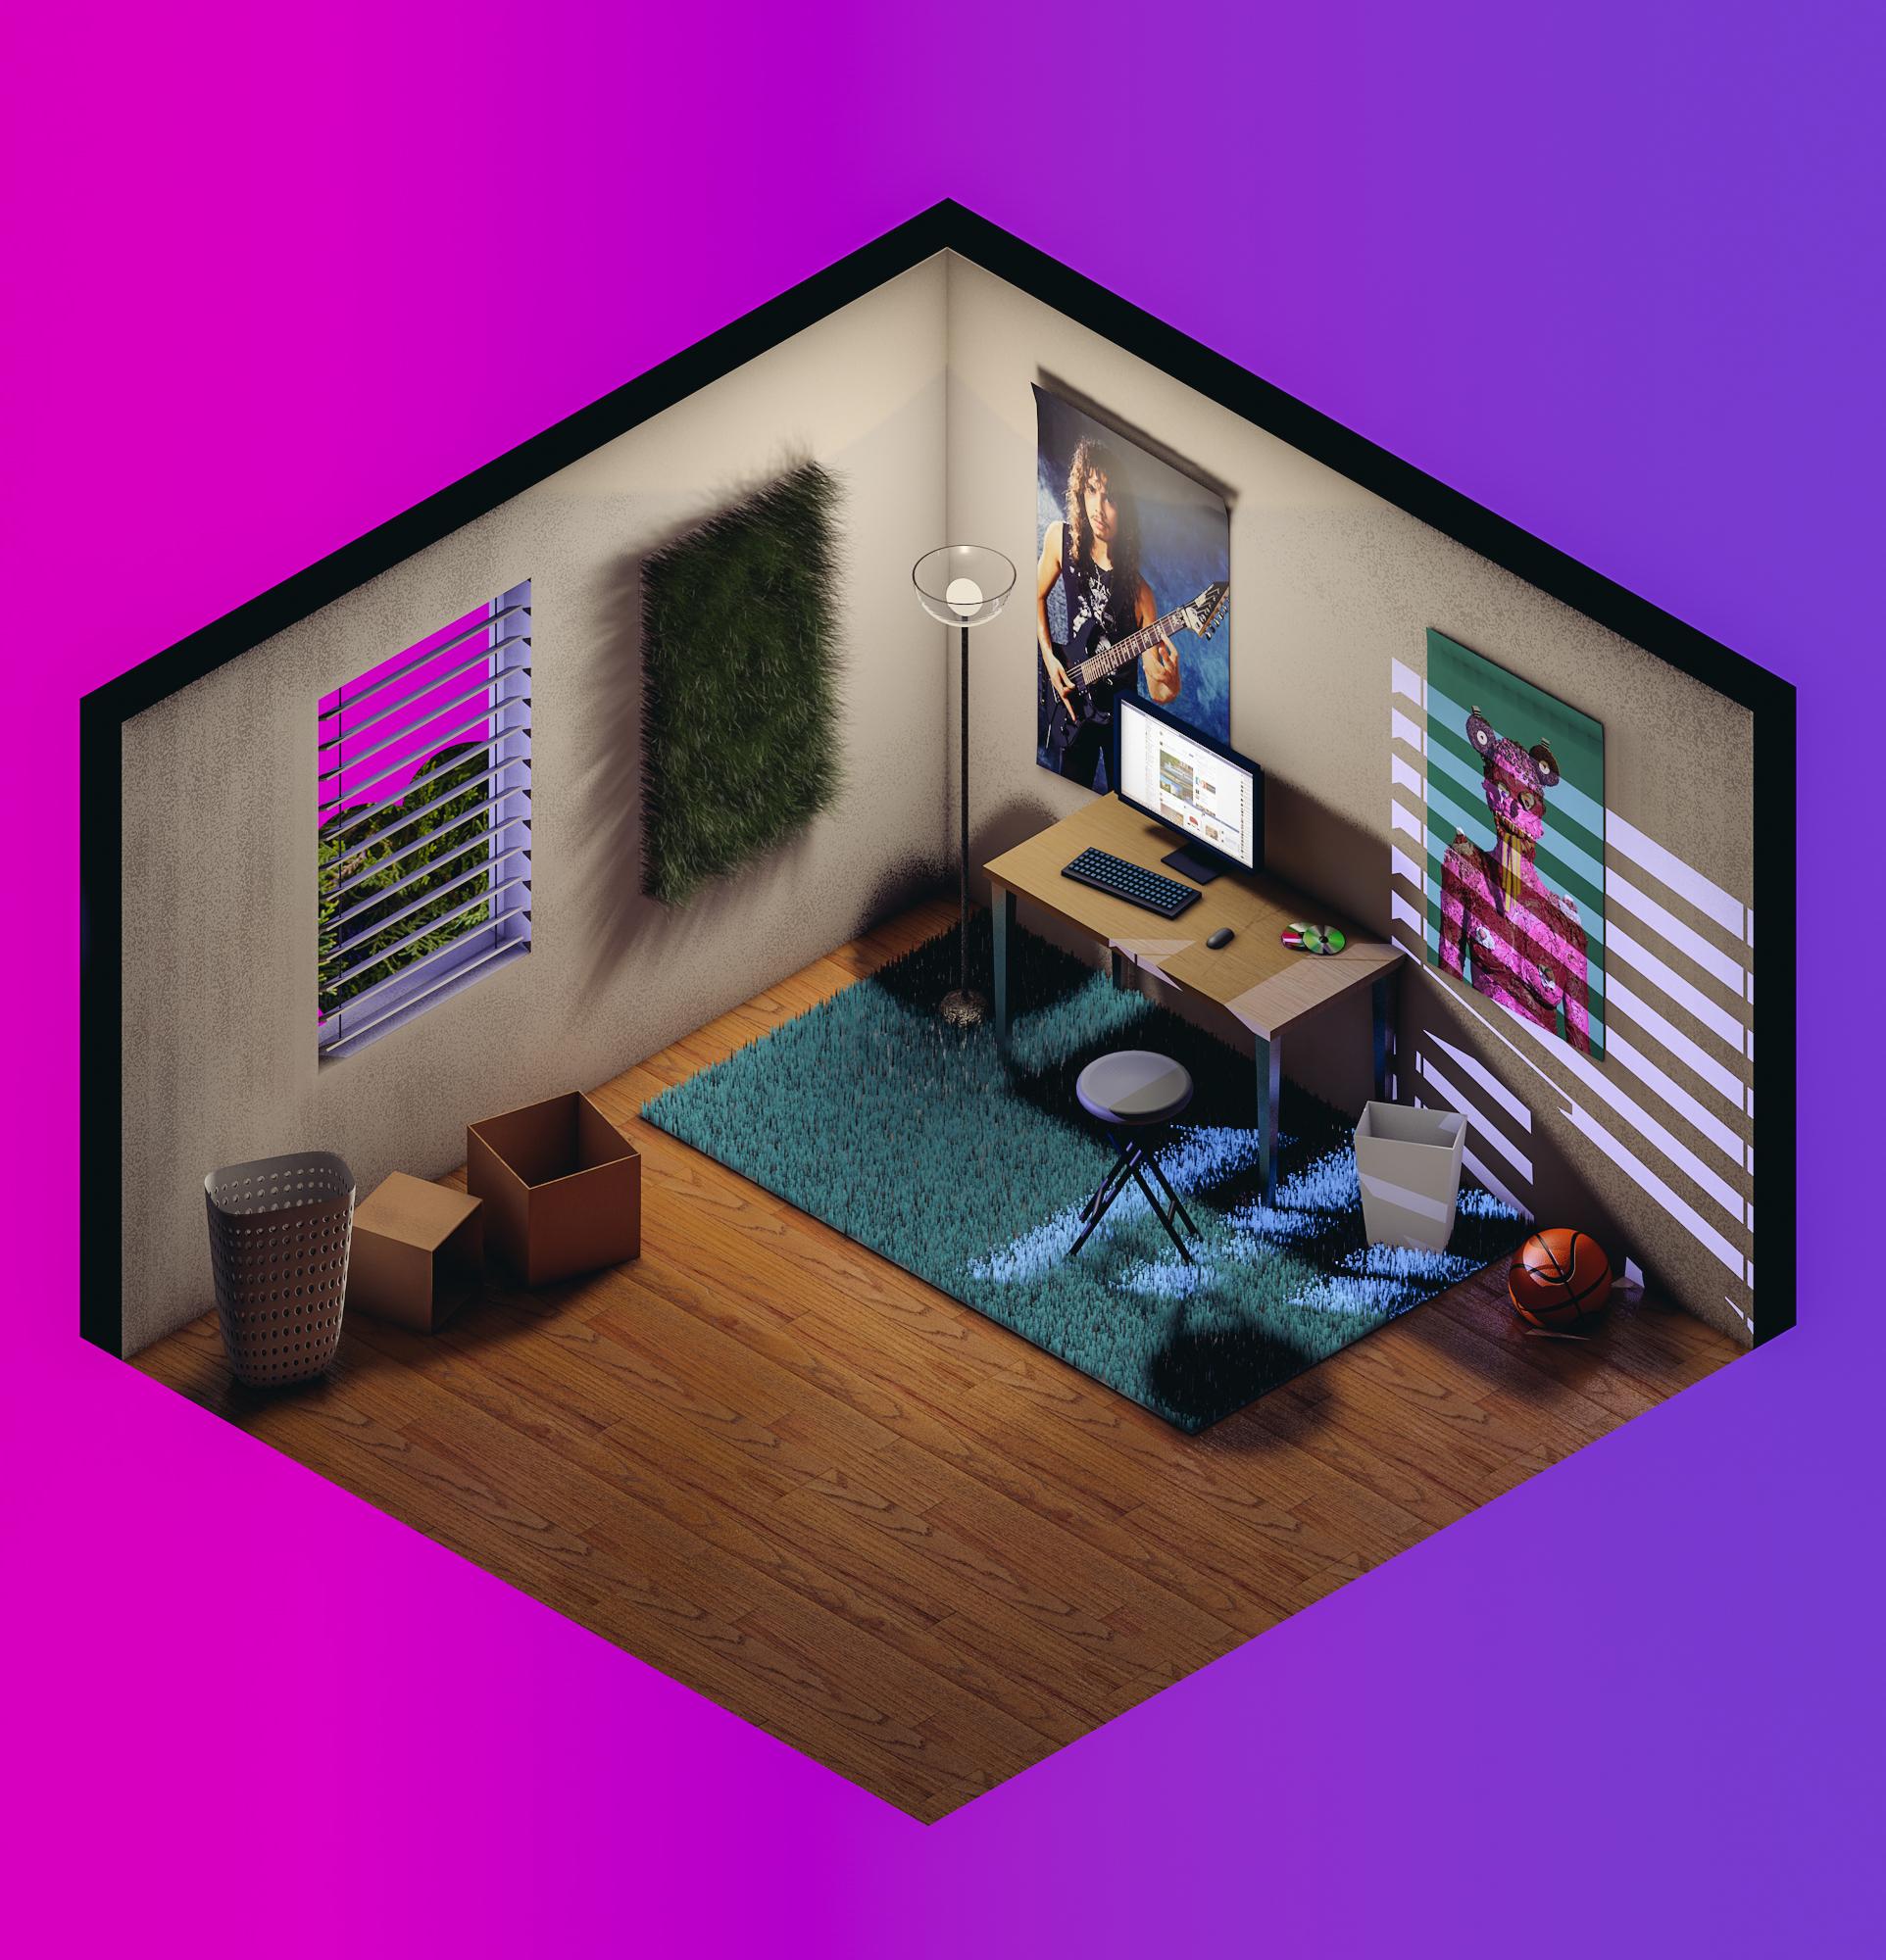 Isometric Room8ao+gi123123.jpg